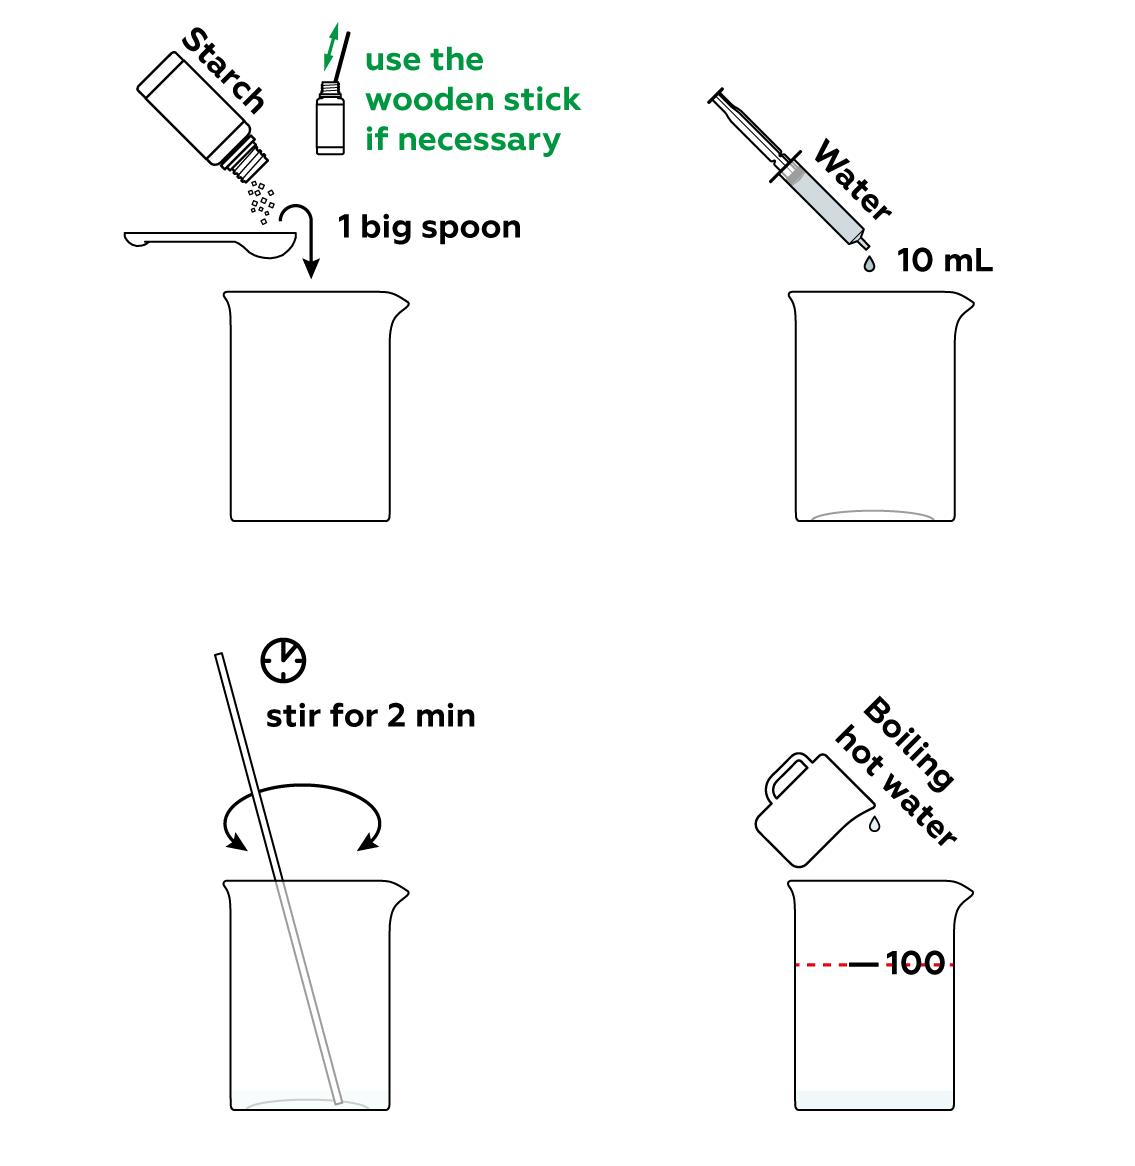 diffusion-v2_potato_en-astm963_iks-s-01